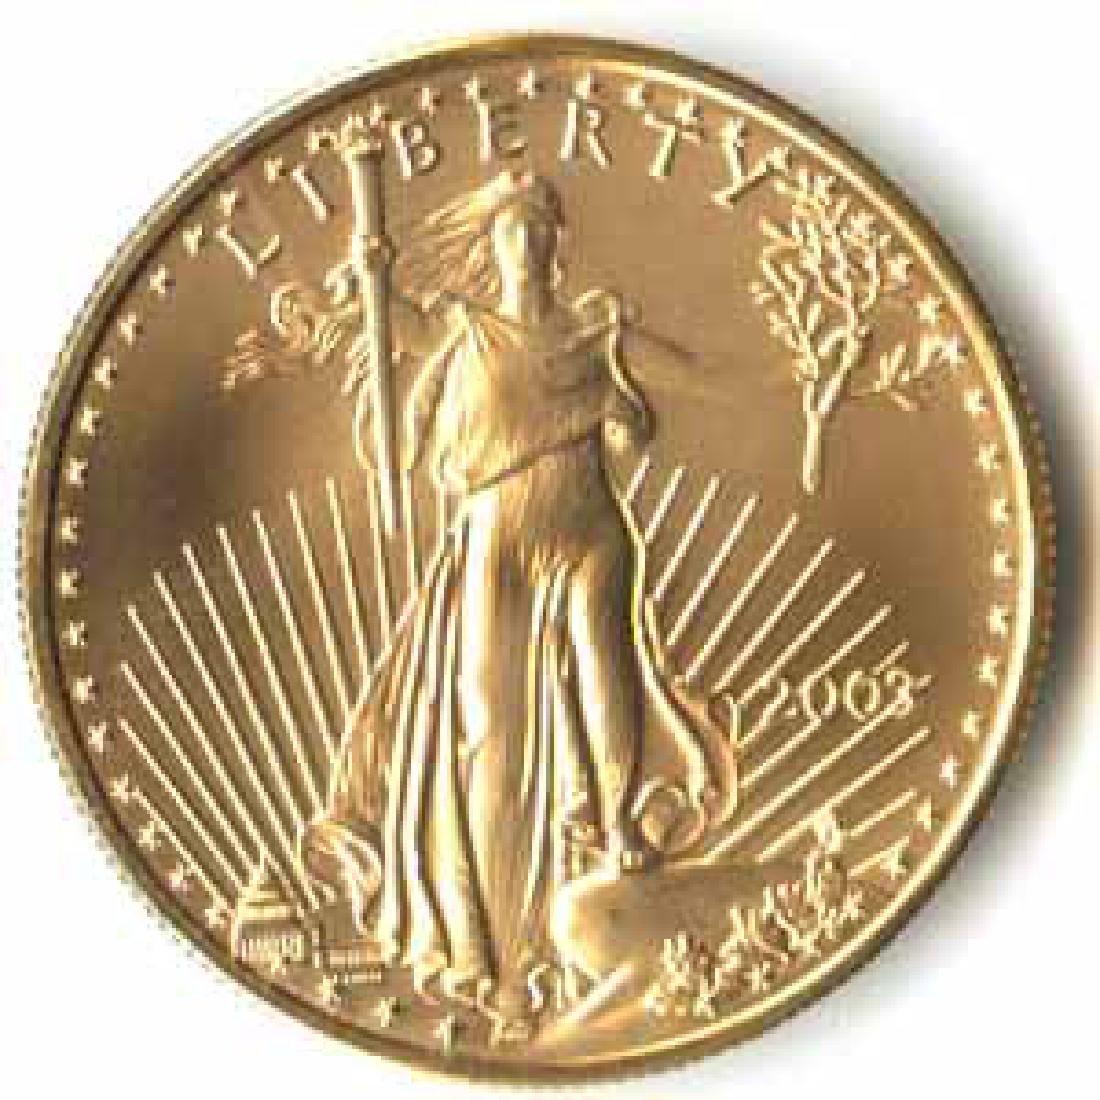 2003 American Gold Eagle 1oz Uncirculated